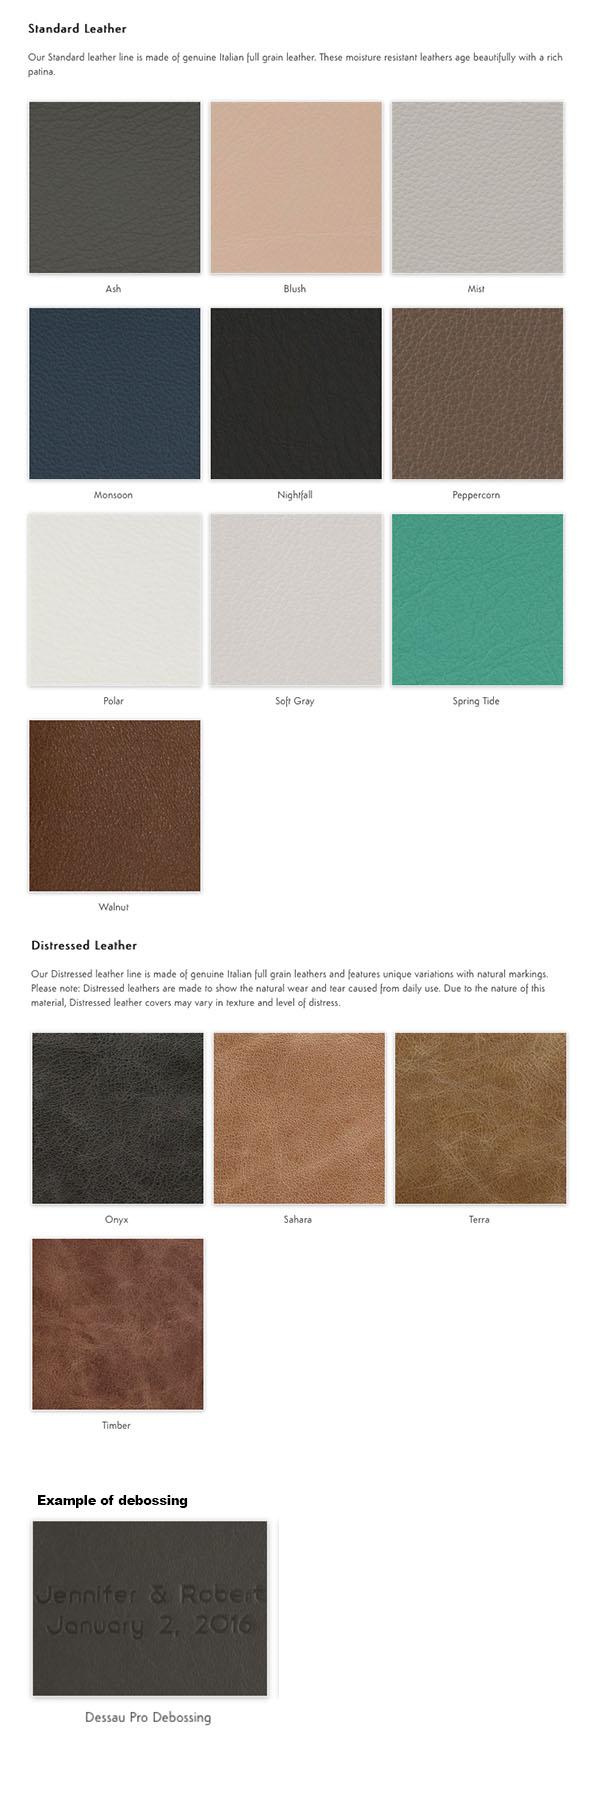 leathercovers.jpg